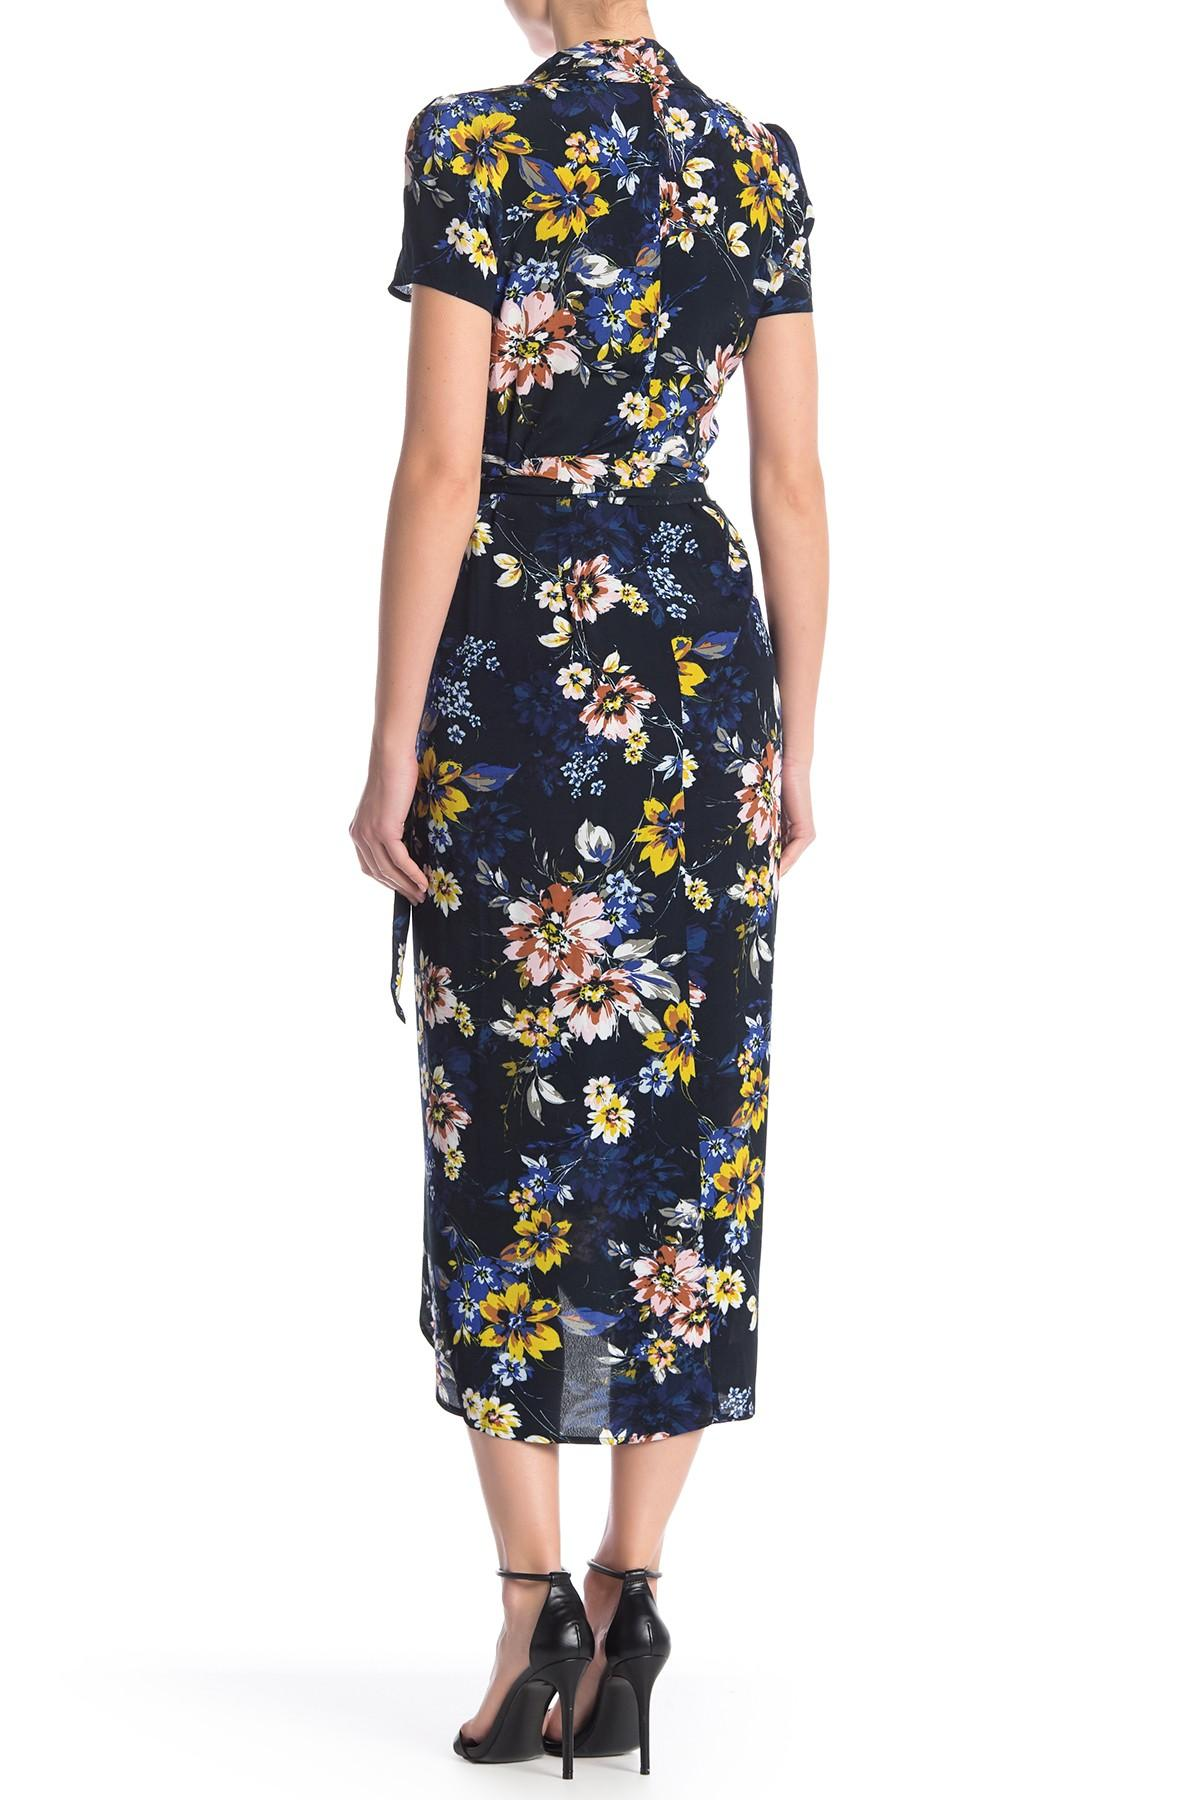 Yumi Kim Meet Amp Greet Floral Wrap Dress In Blue Lyst